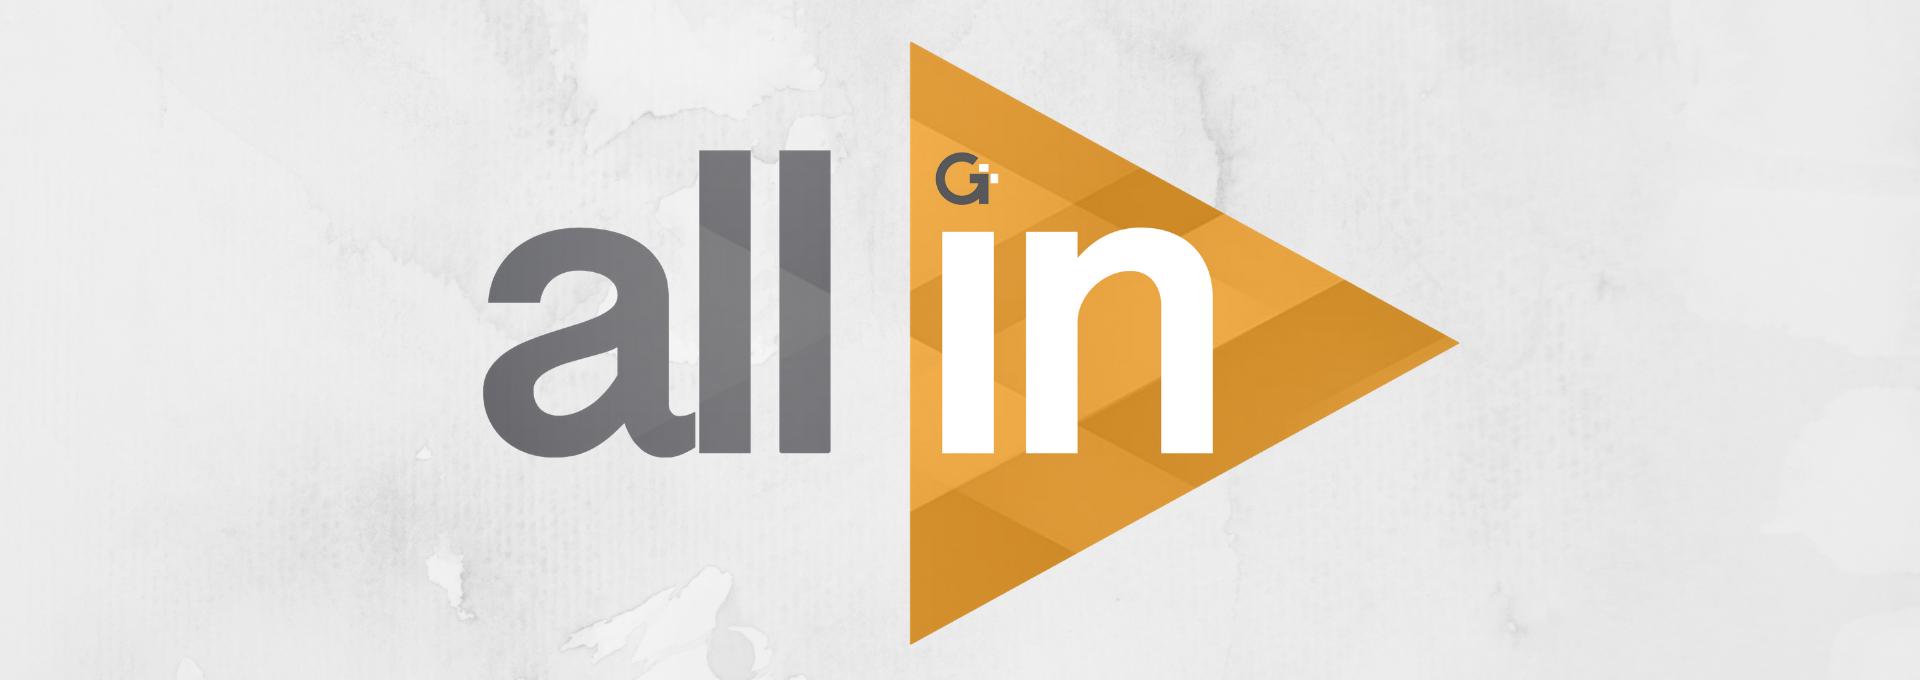 All In - January 2019 logo